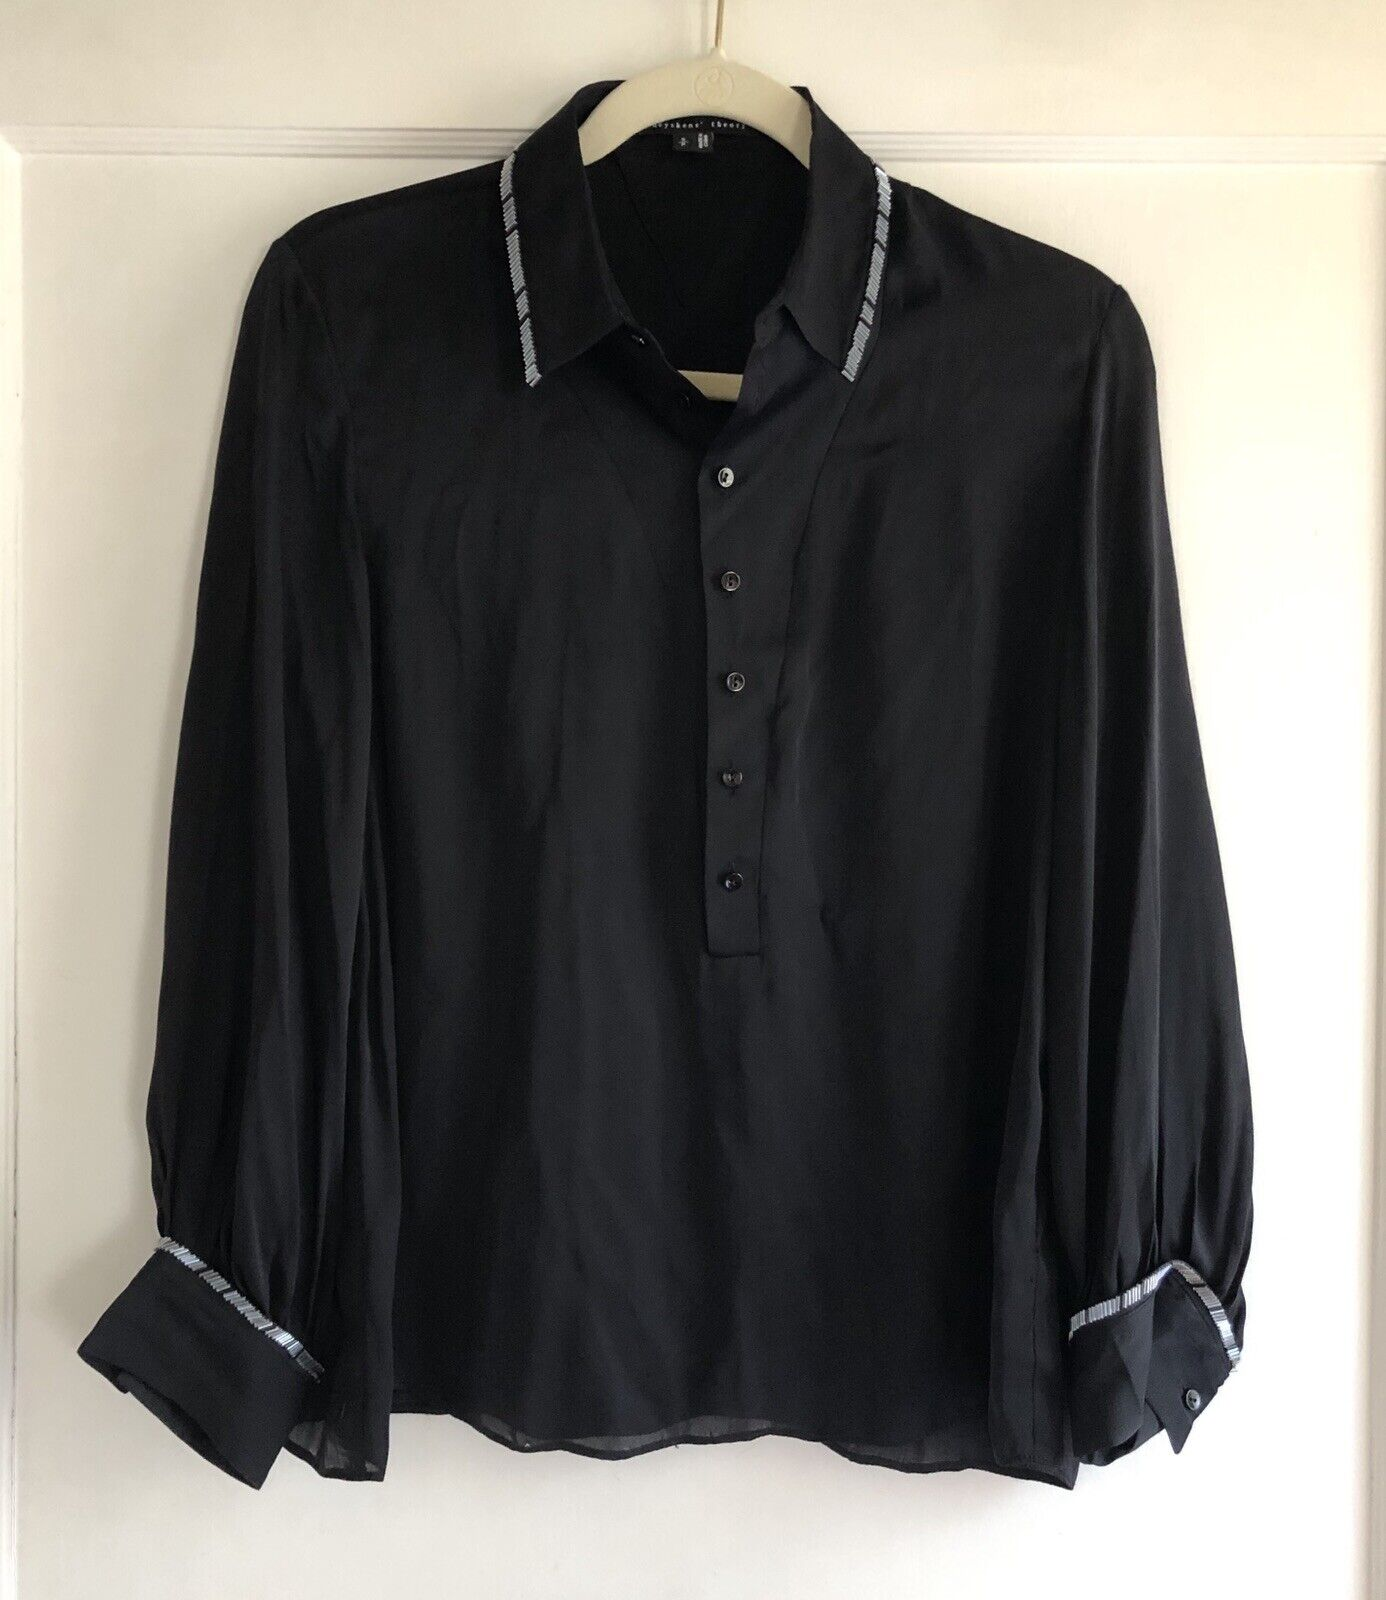 ecb92364baeed Theory Theyskens 100% Silk schwarz Beaded Trim Blouse Top Größe Small